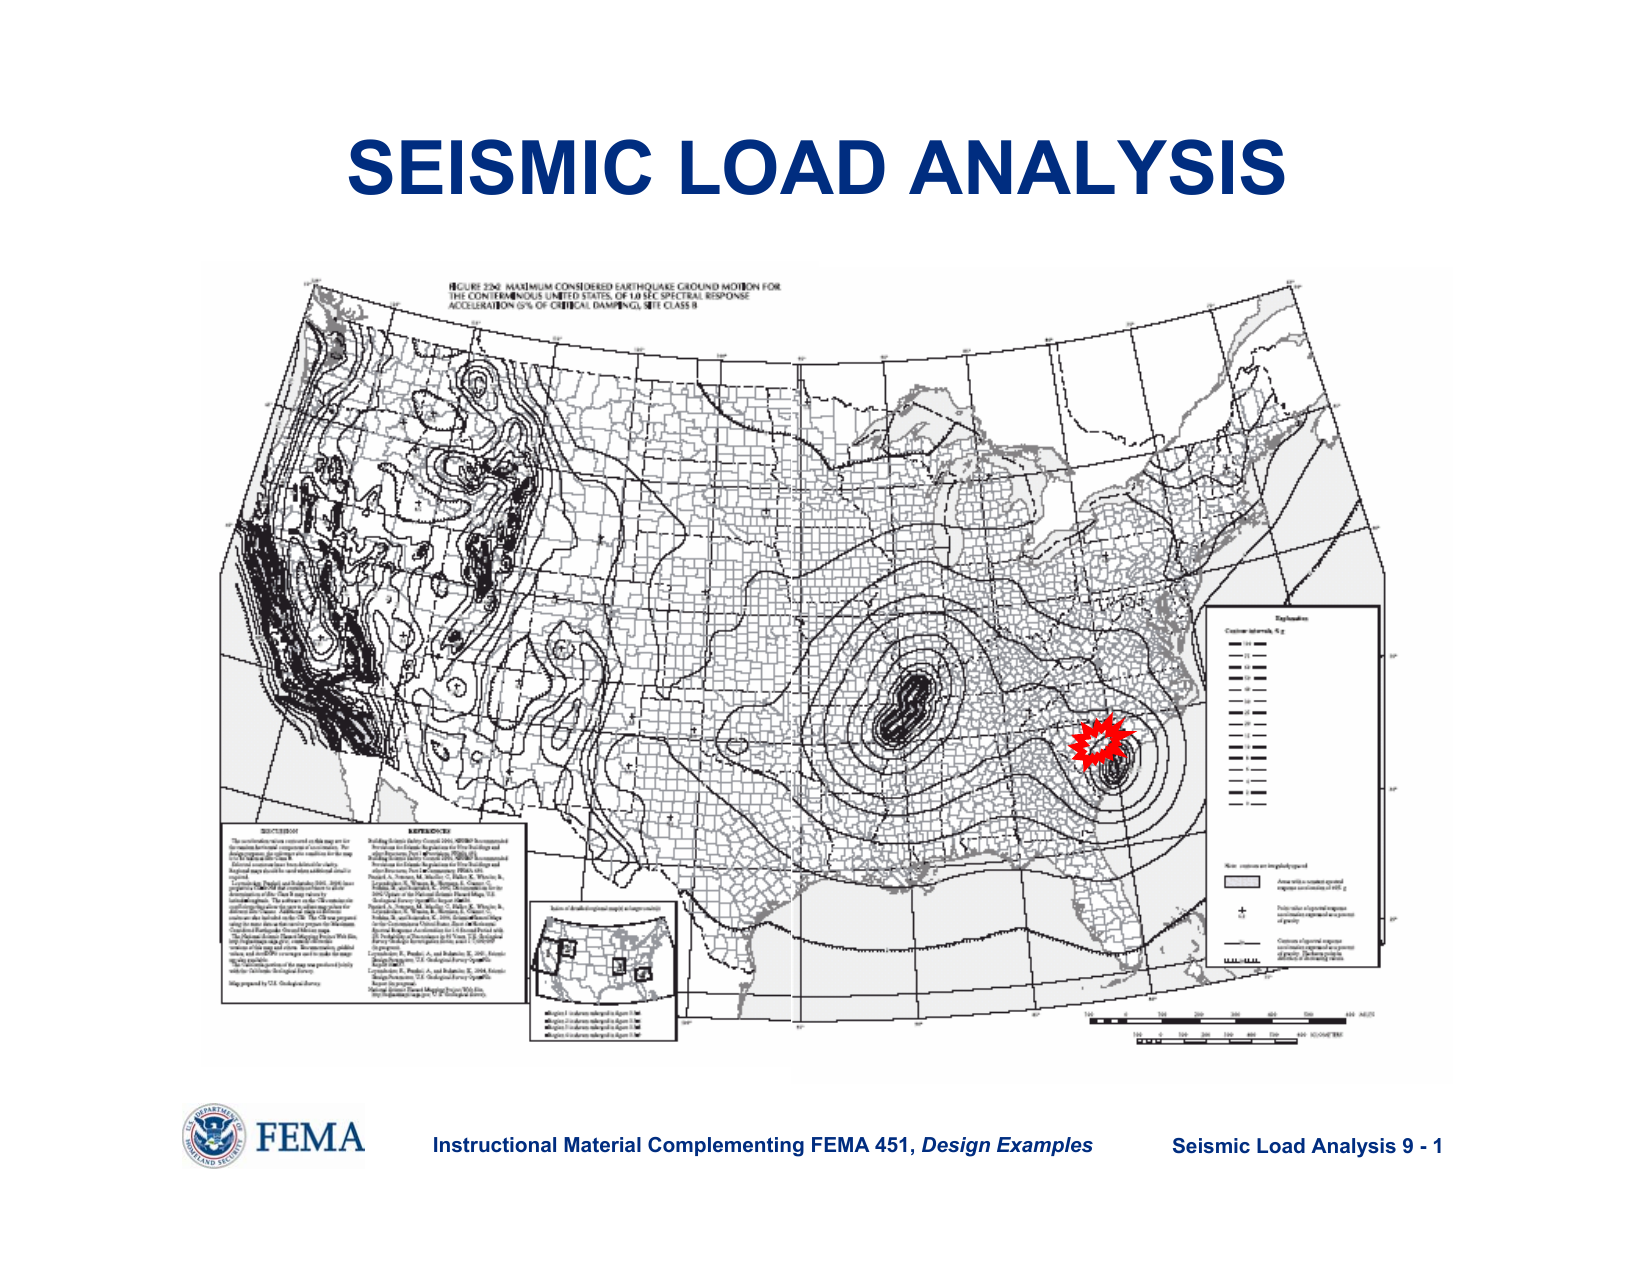 Seismic Load Analysis